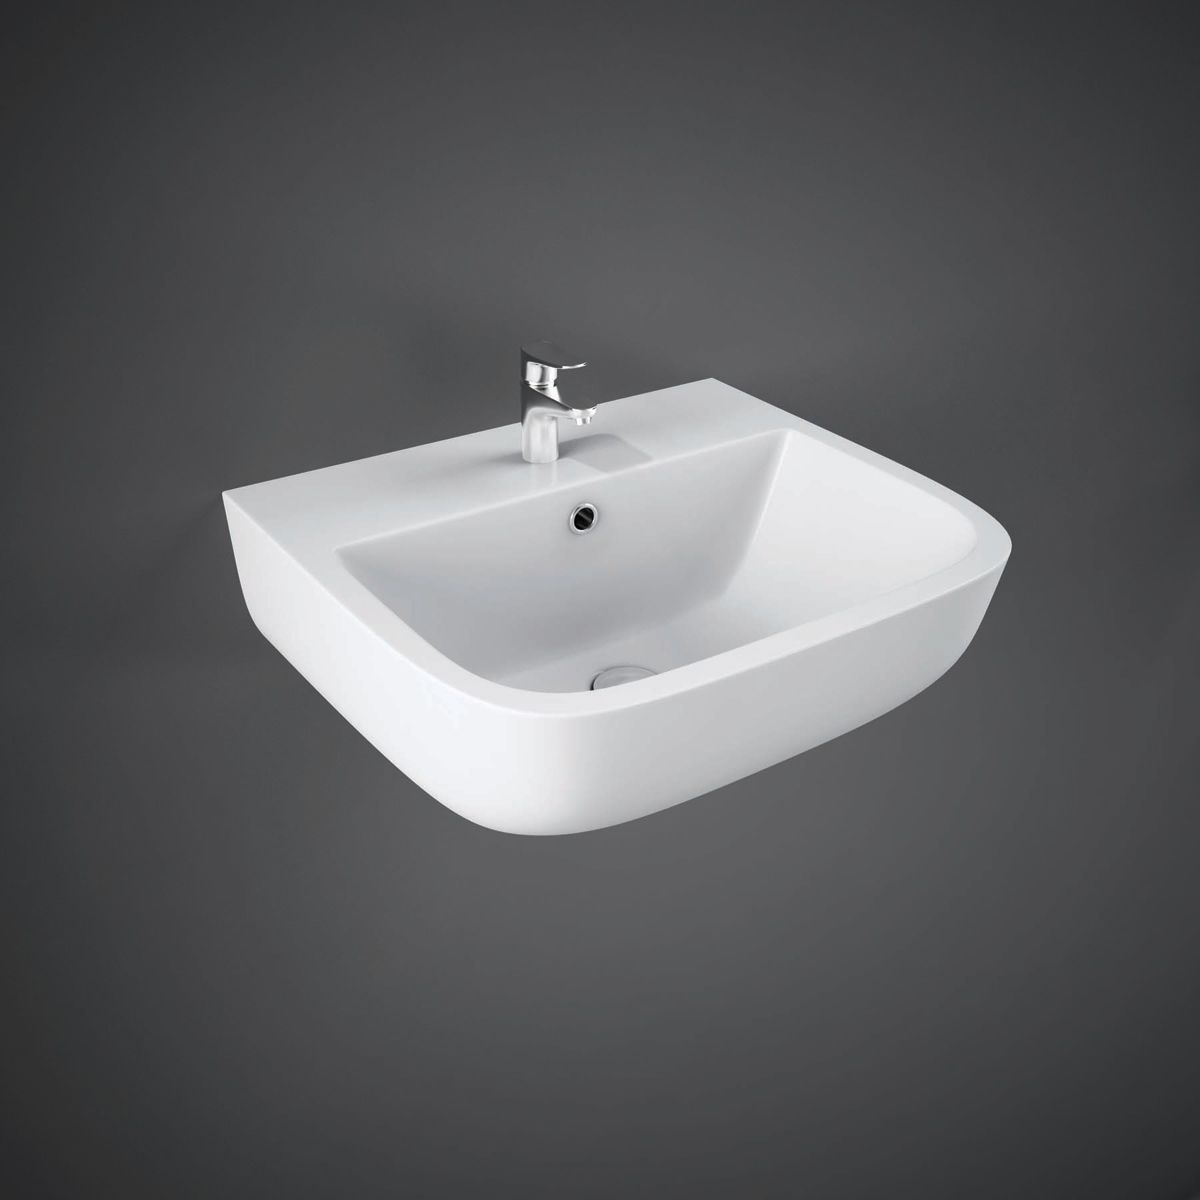 RAK Series 600 Hand Basin 400mm